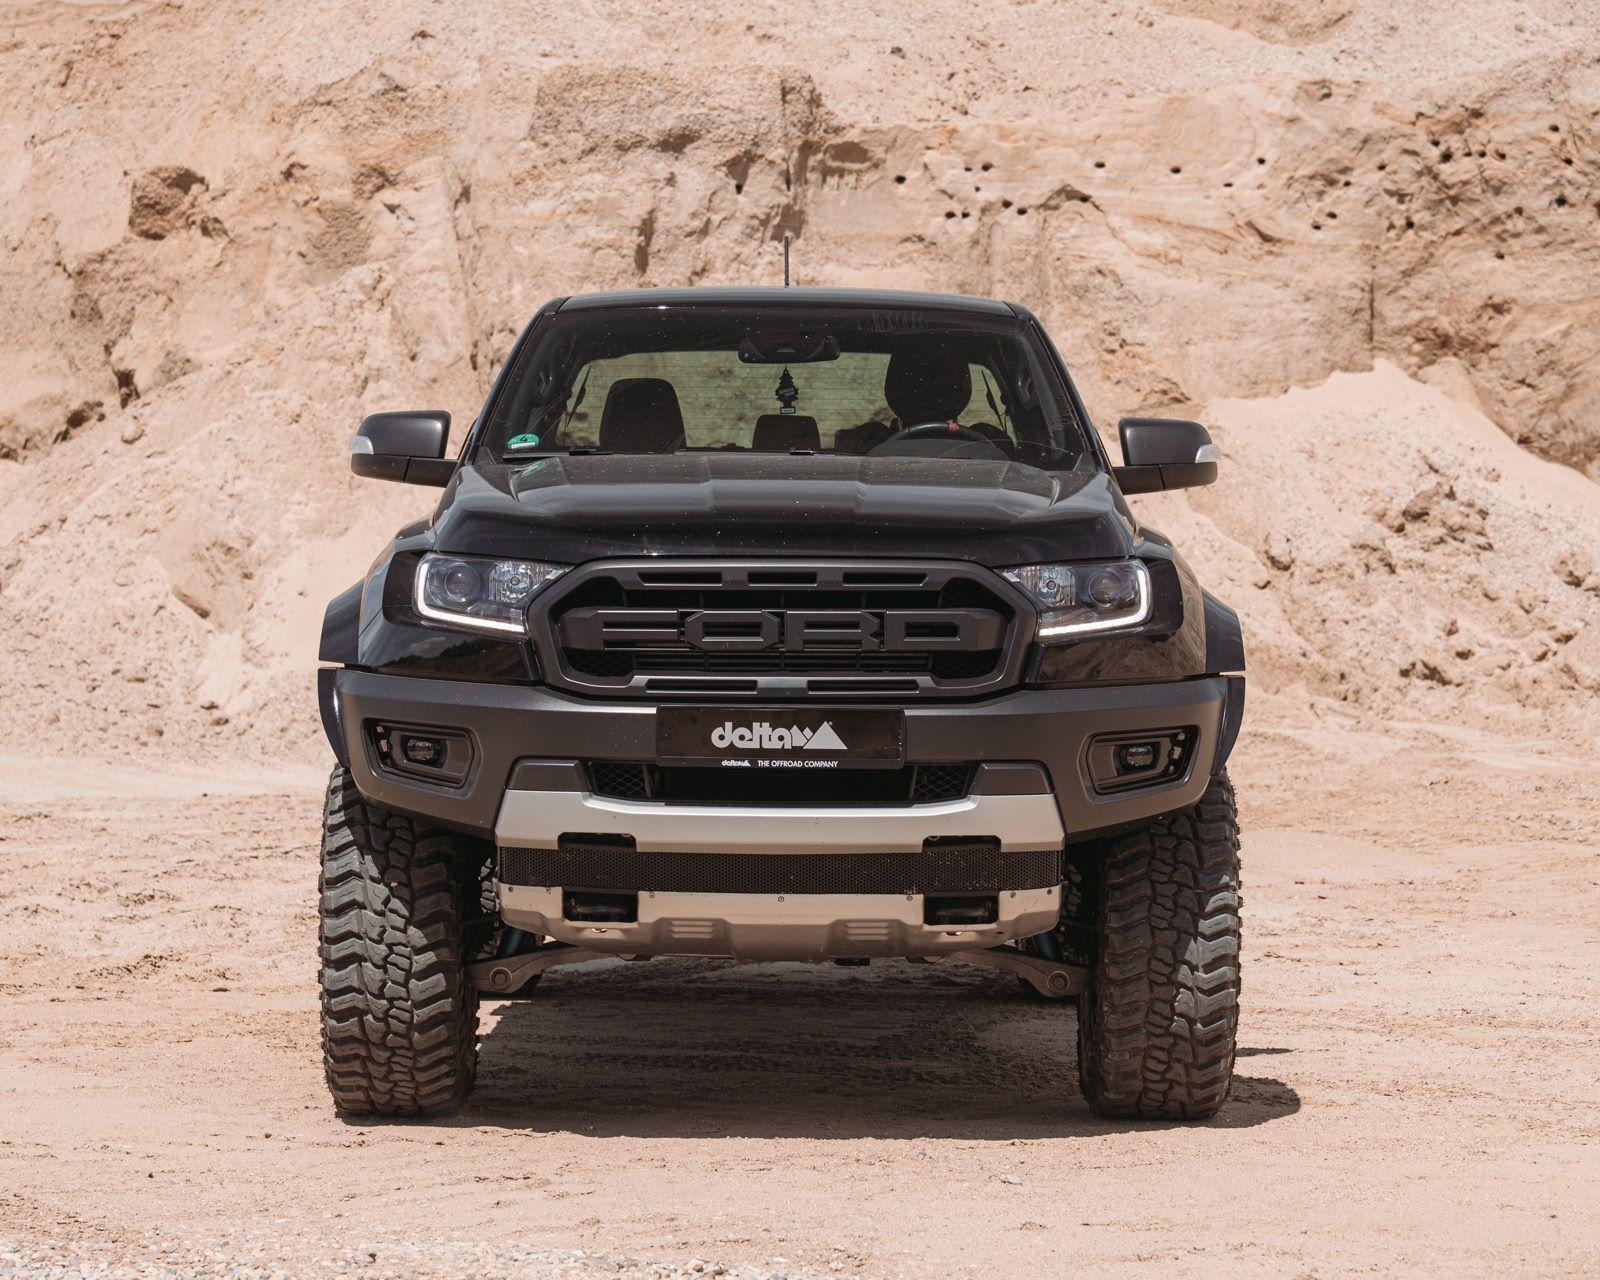 Ford-Ranger-Raptor-by-Delta-4x4-1